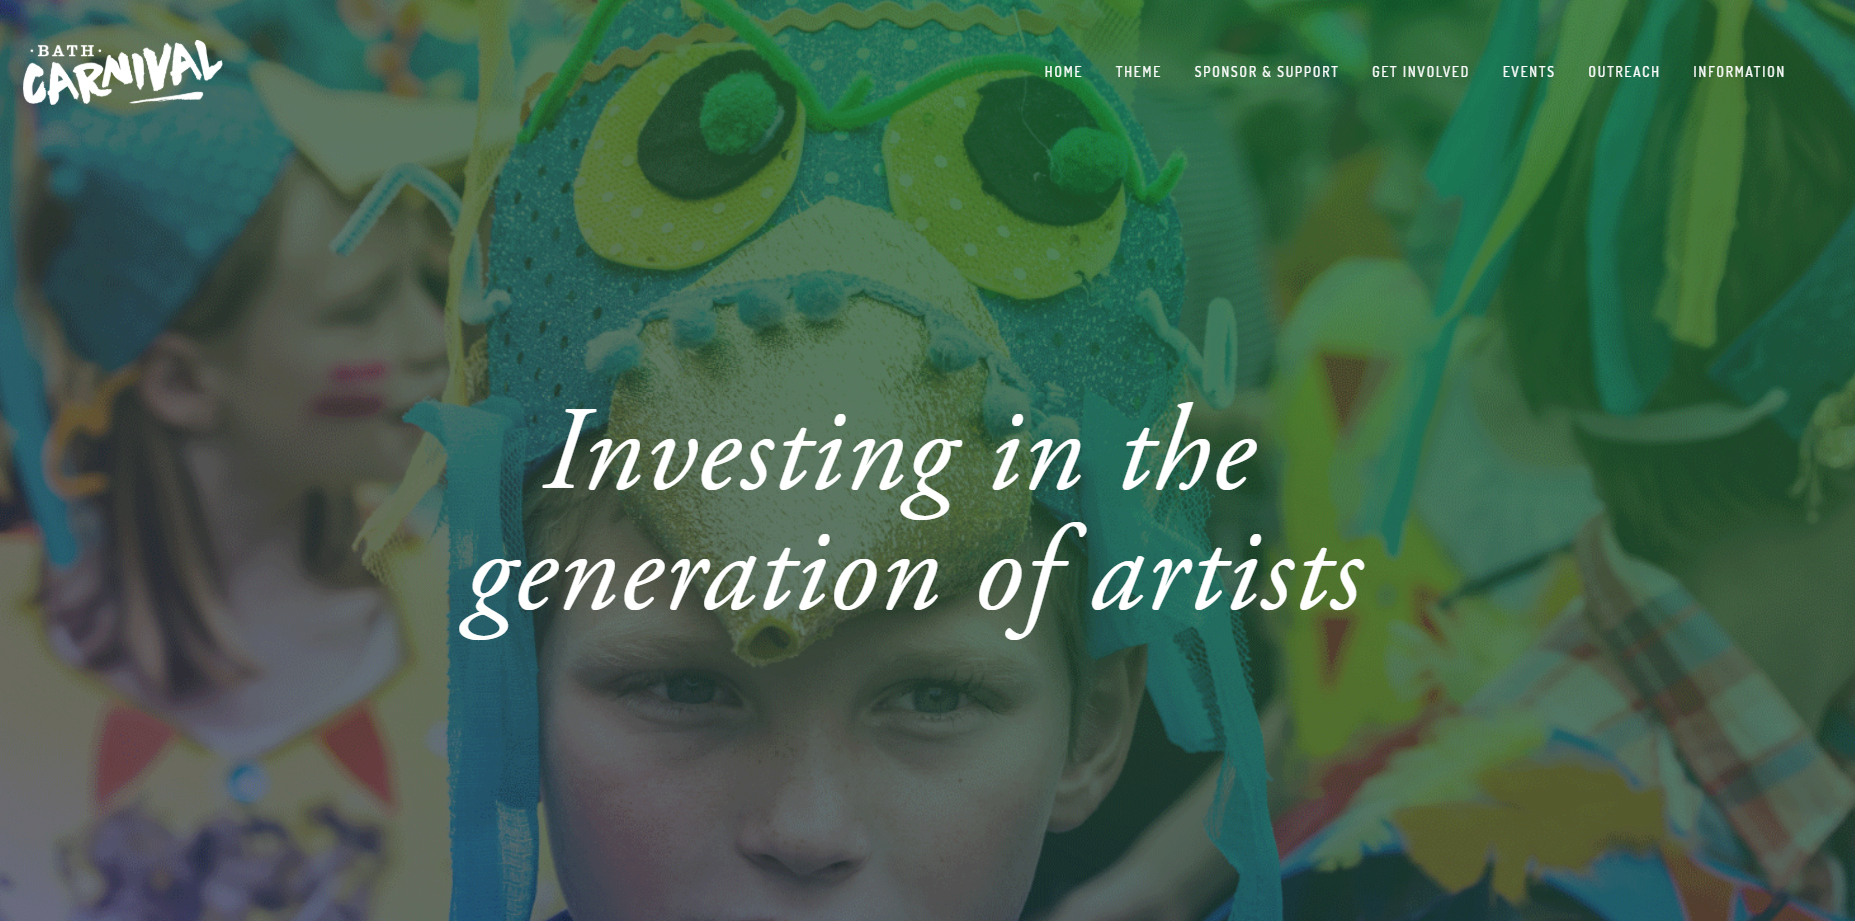 Bath Carnival - Website Design